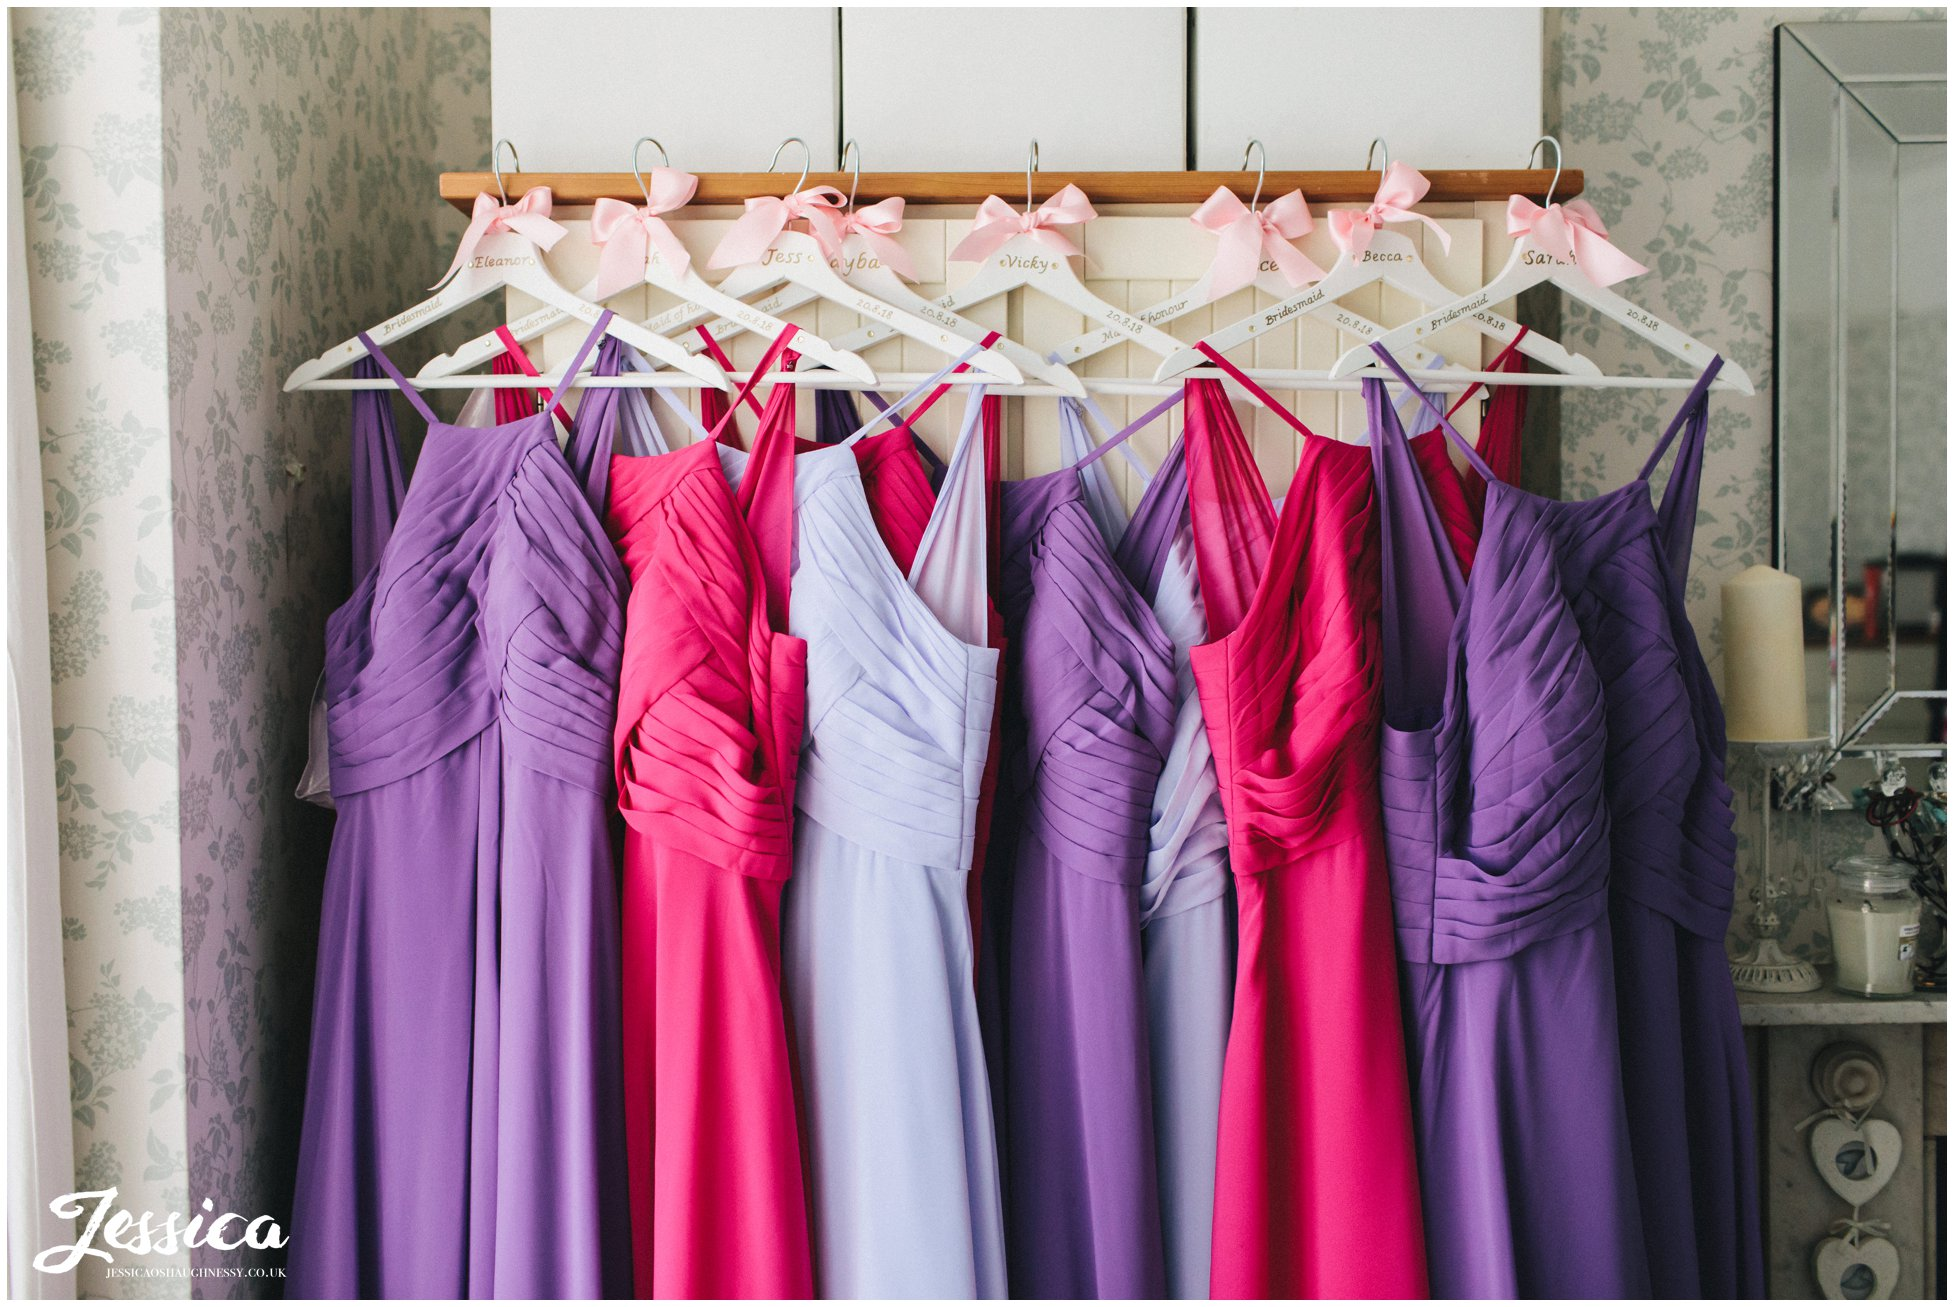 bridesmaids dresses hung on the wardrobe